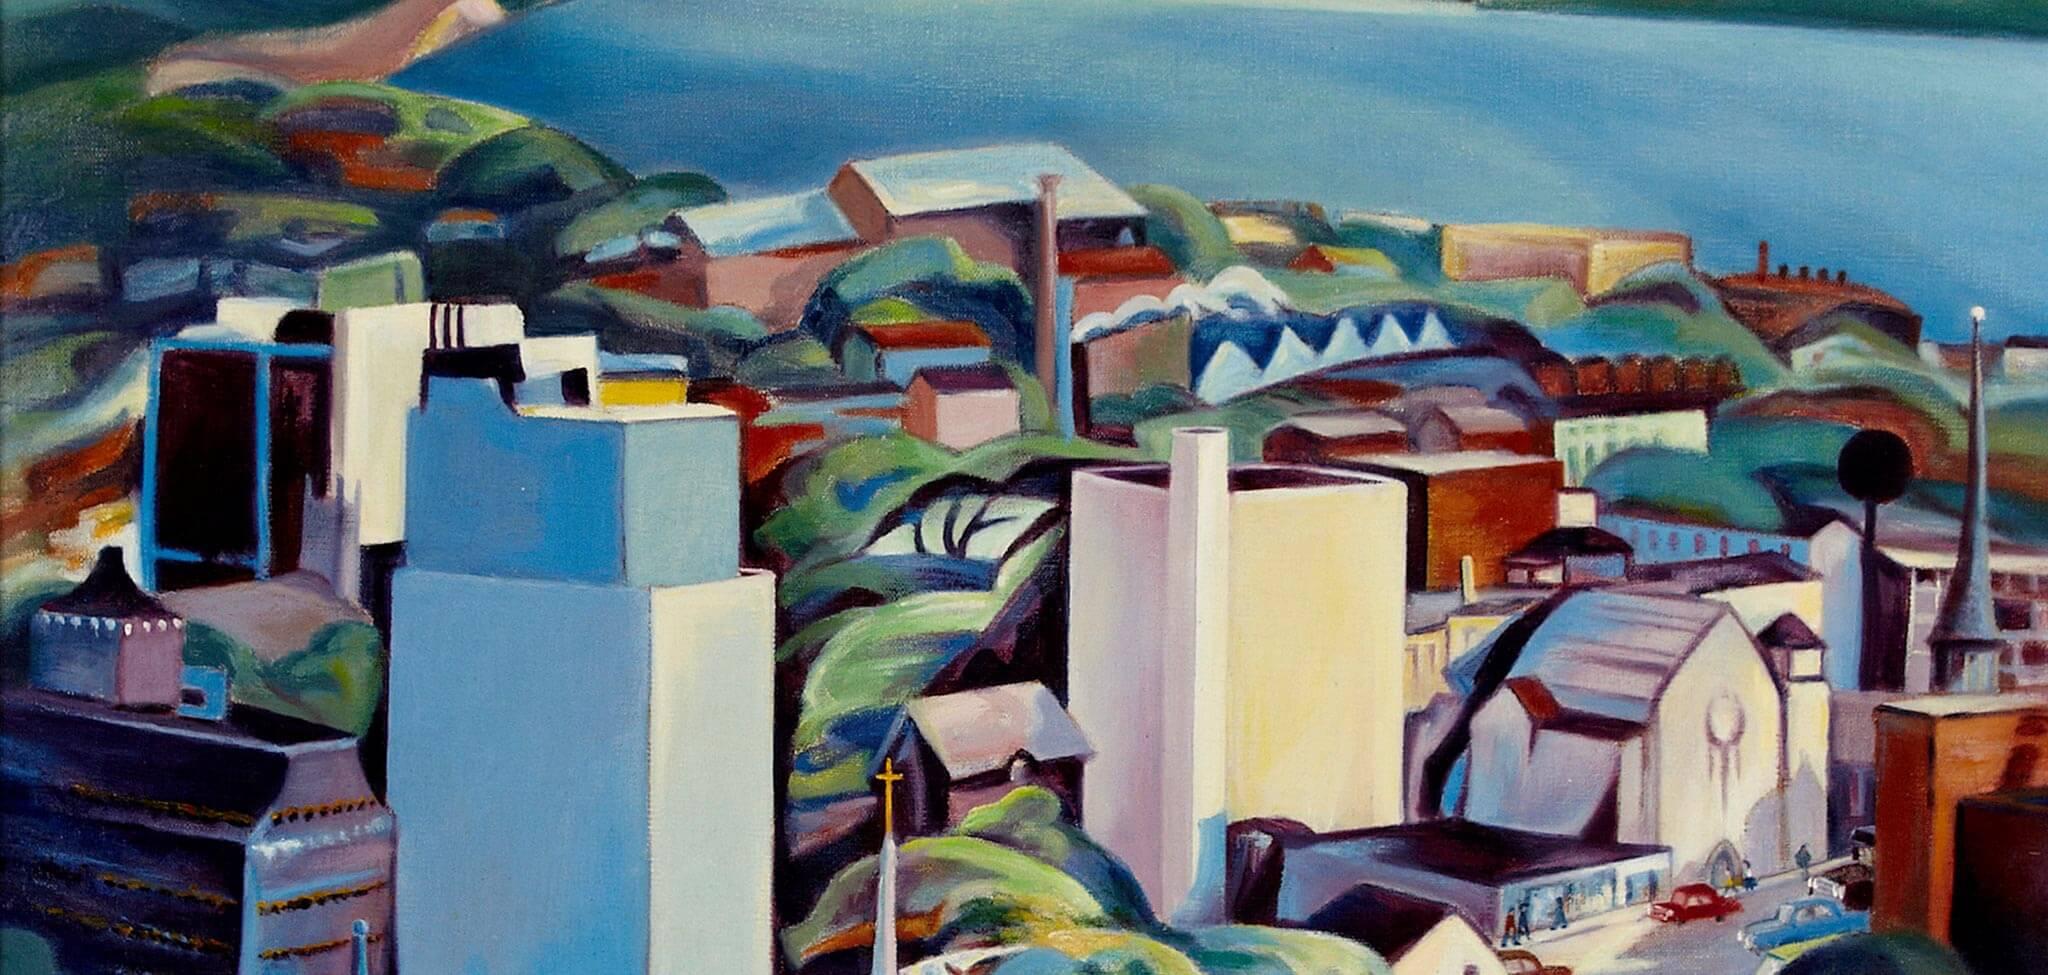 Art Gallery of Hamilton - Saga of a City: Hamilton at 200